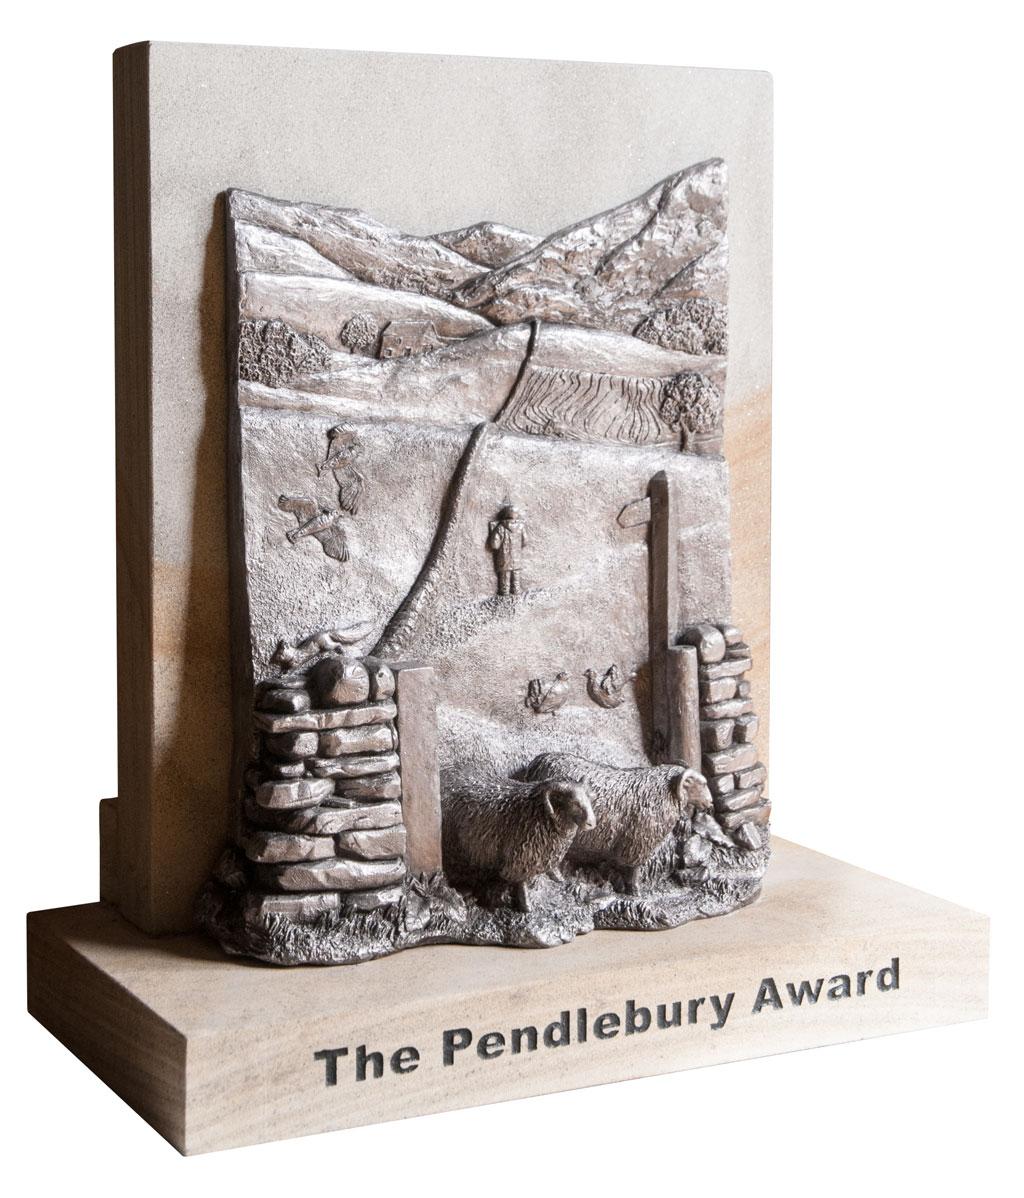 'The Pendlebury Award'